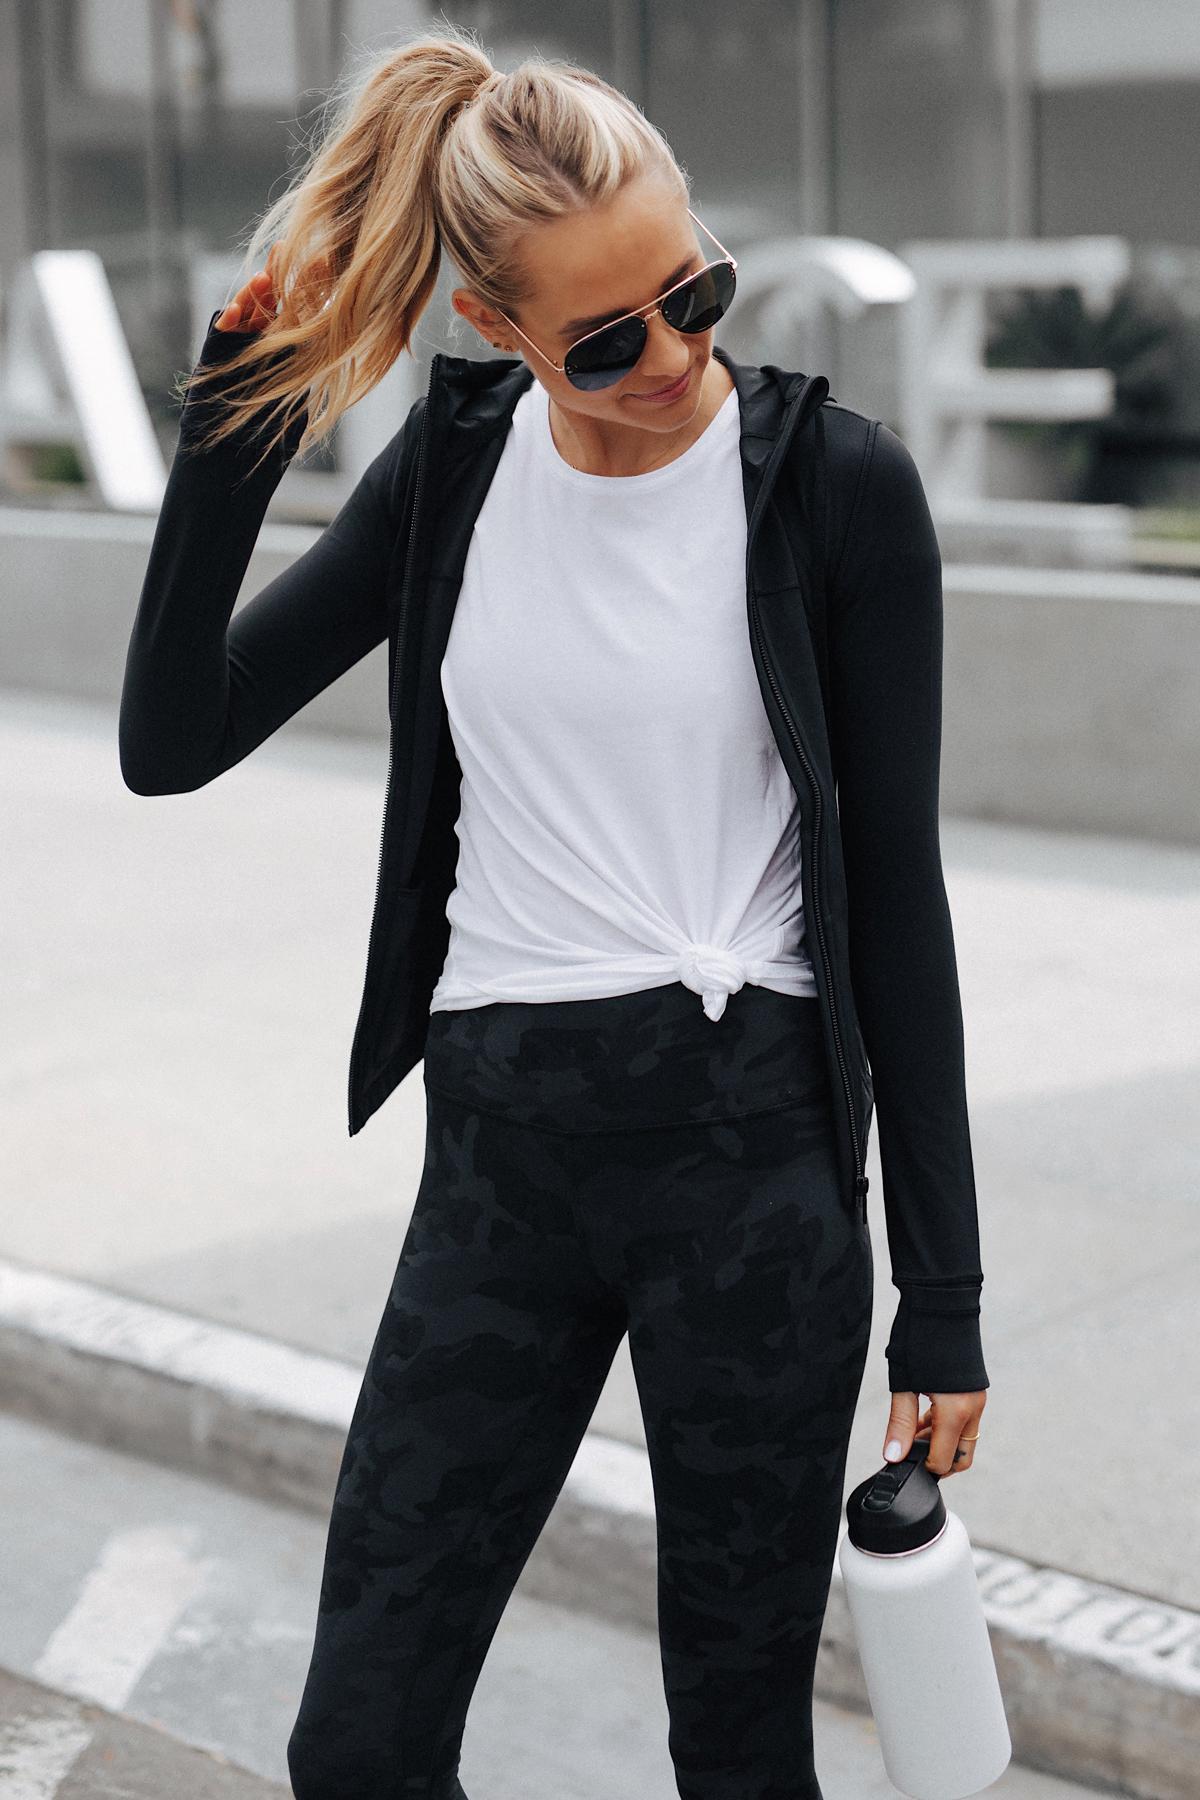 Blonde Woman Wearing Lululemon Align Pants Black Camo Print Lululemon Black Jacket White Top Fashion Jackson San Diego Fashion Blogger Fitness Style